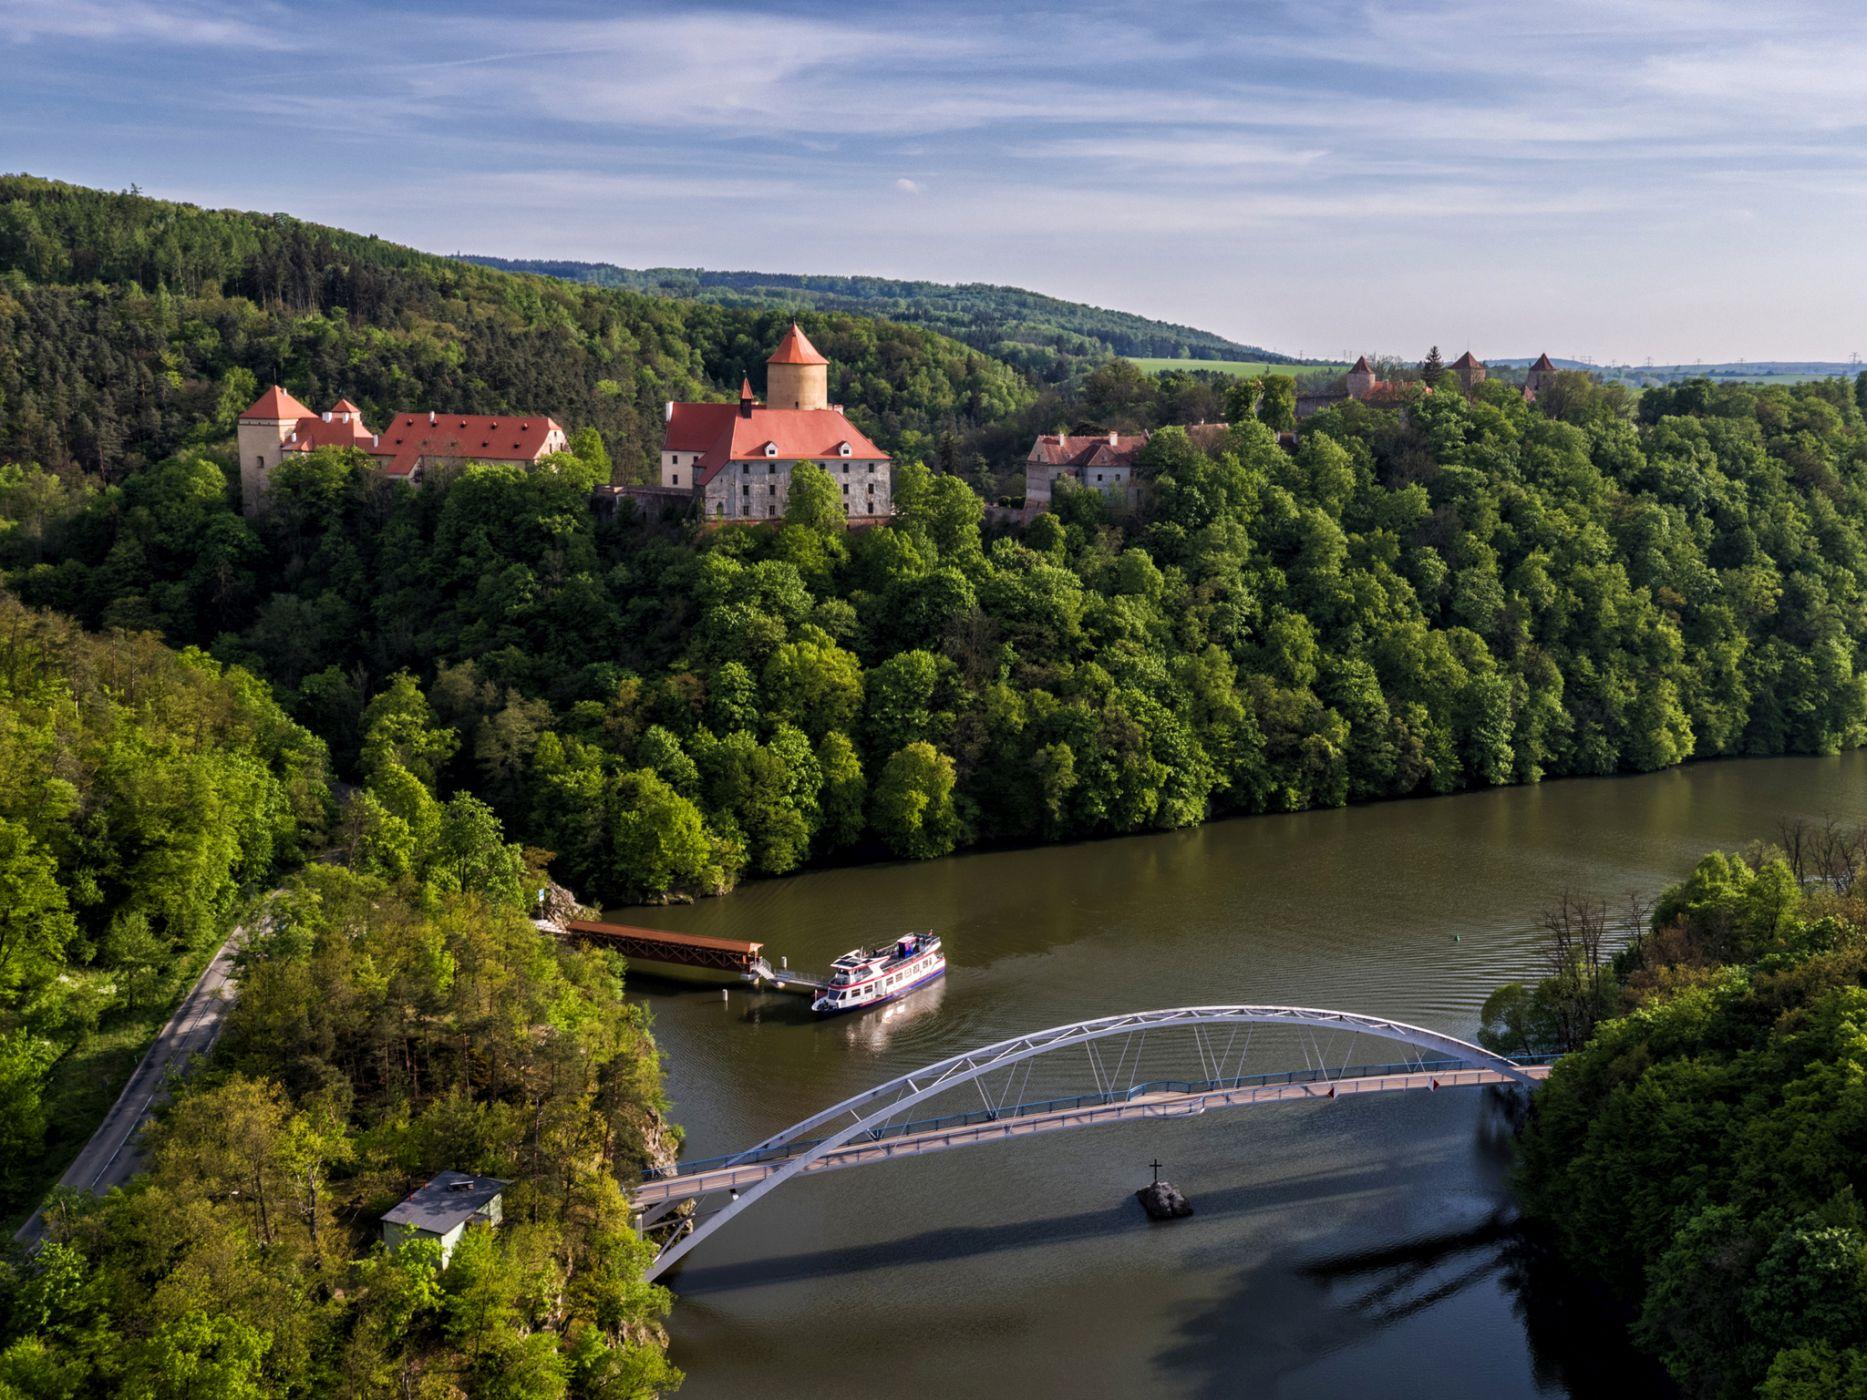 Burg Veveří (Hrad Veveří) in Brünn